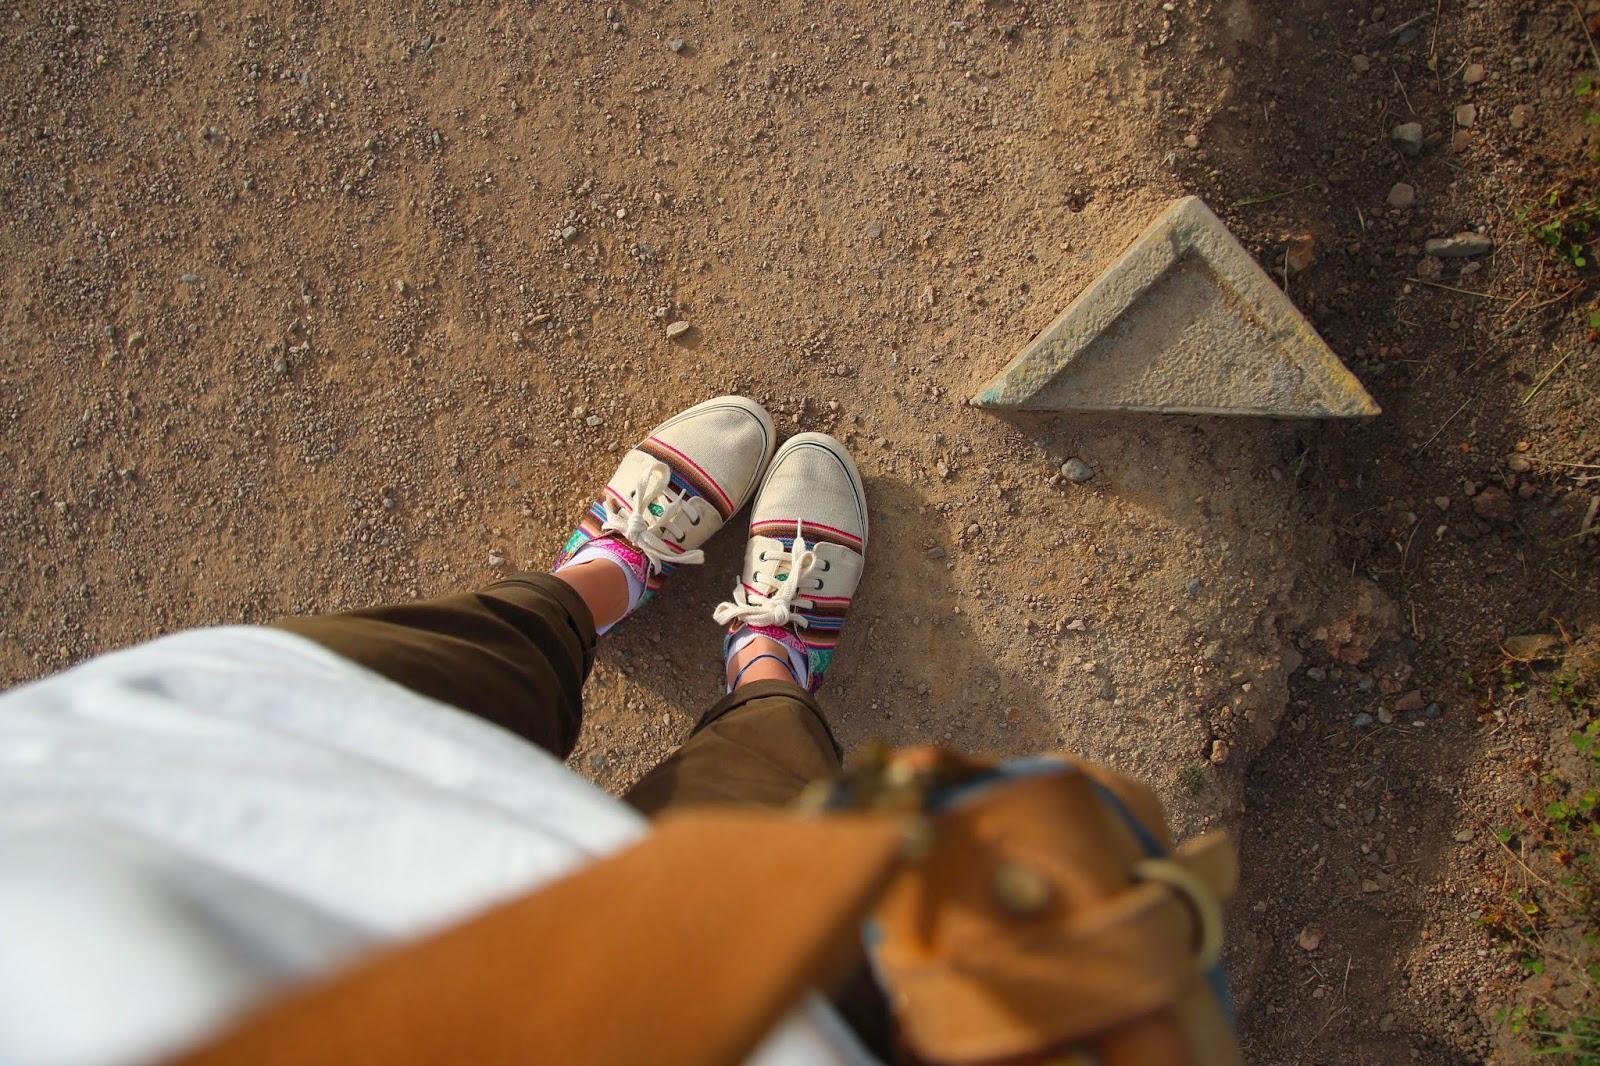 Mipacha, AG Jeans, fashion blogger, Ruinas Ingapirca